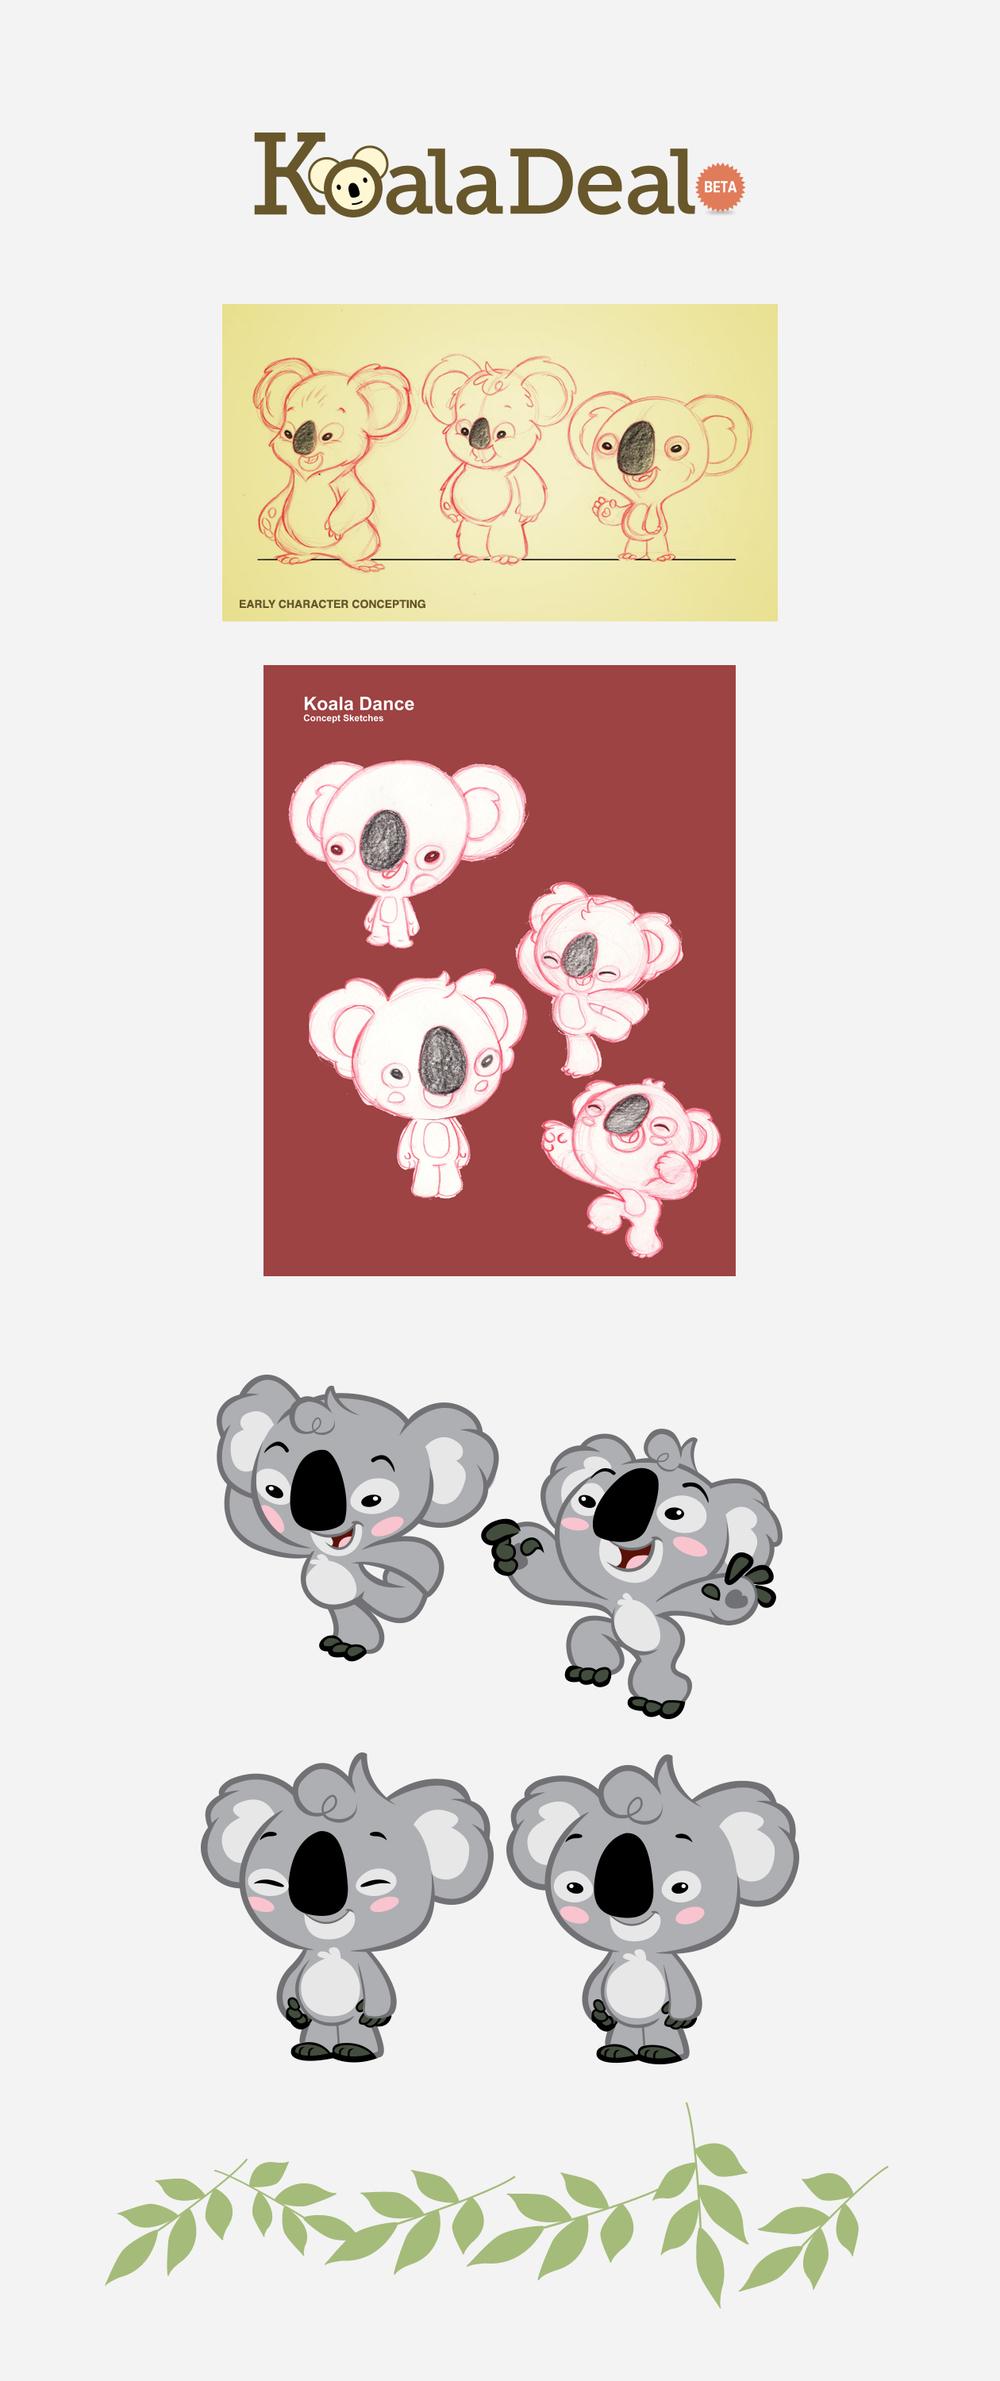 KoalaDeal_Branding.jpg